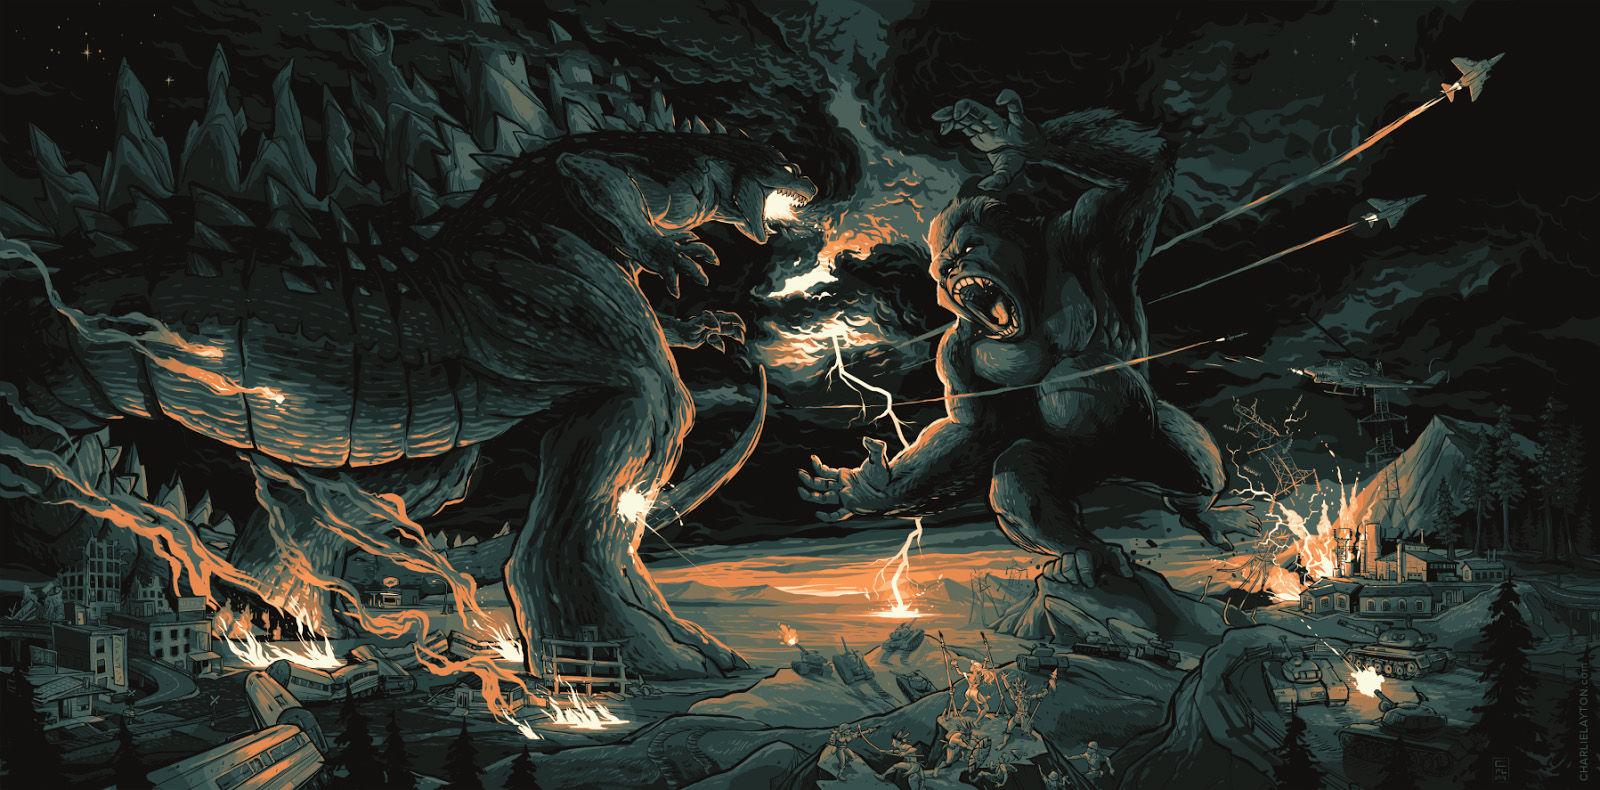 https://cinemaplanet.pt/wp-content/uploads/2017/03/Godzilla-vs-King-Kong-by-Charlie-Layton.jpg